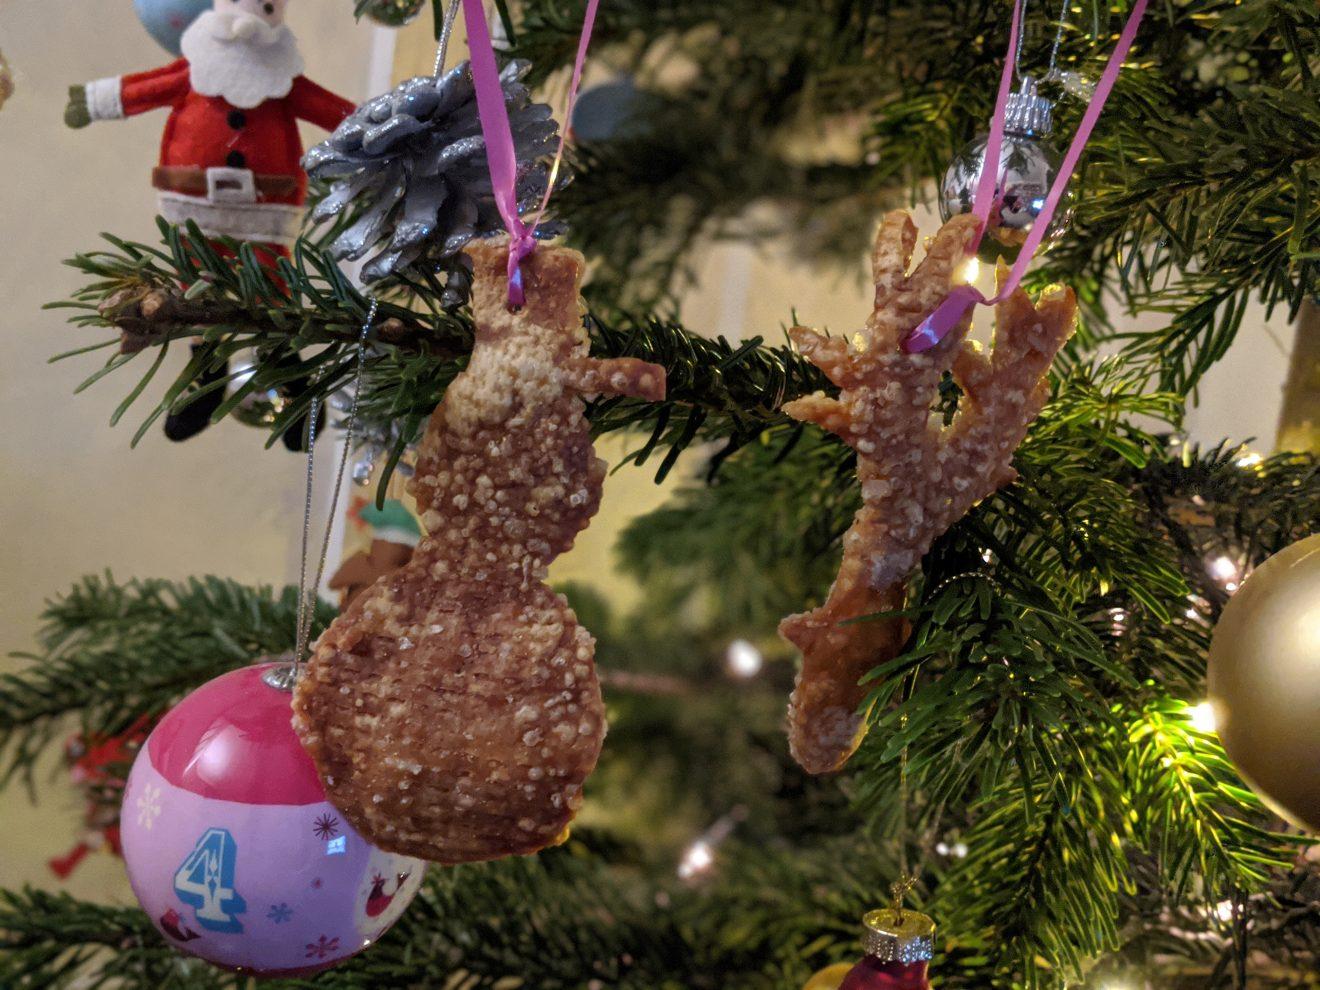 Pork crackling Christmas decorations on a Christmas tree